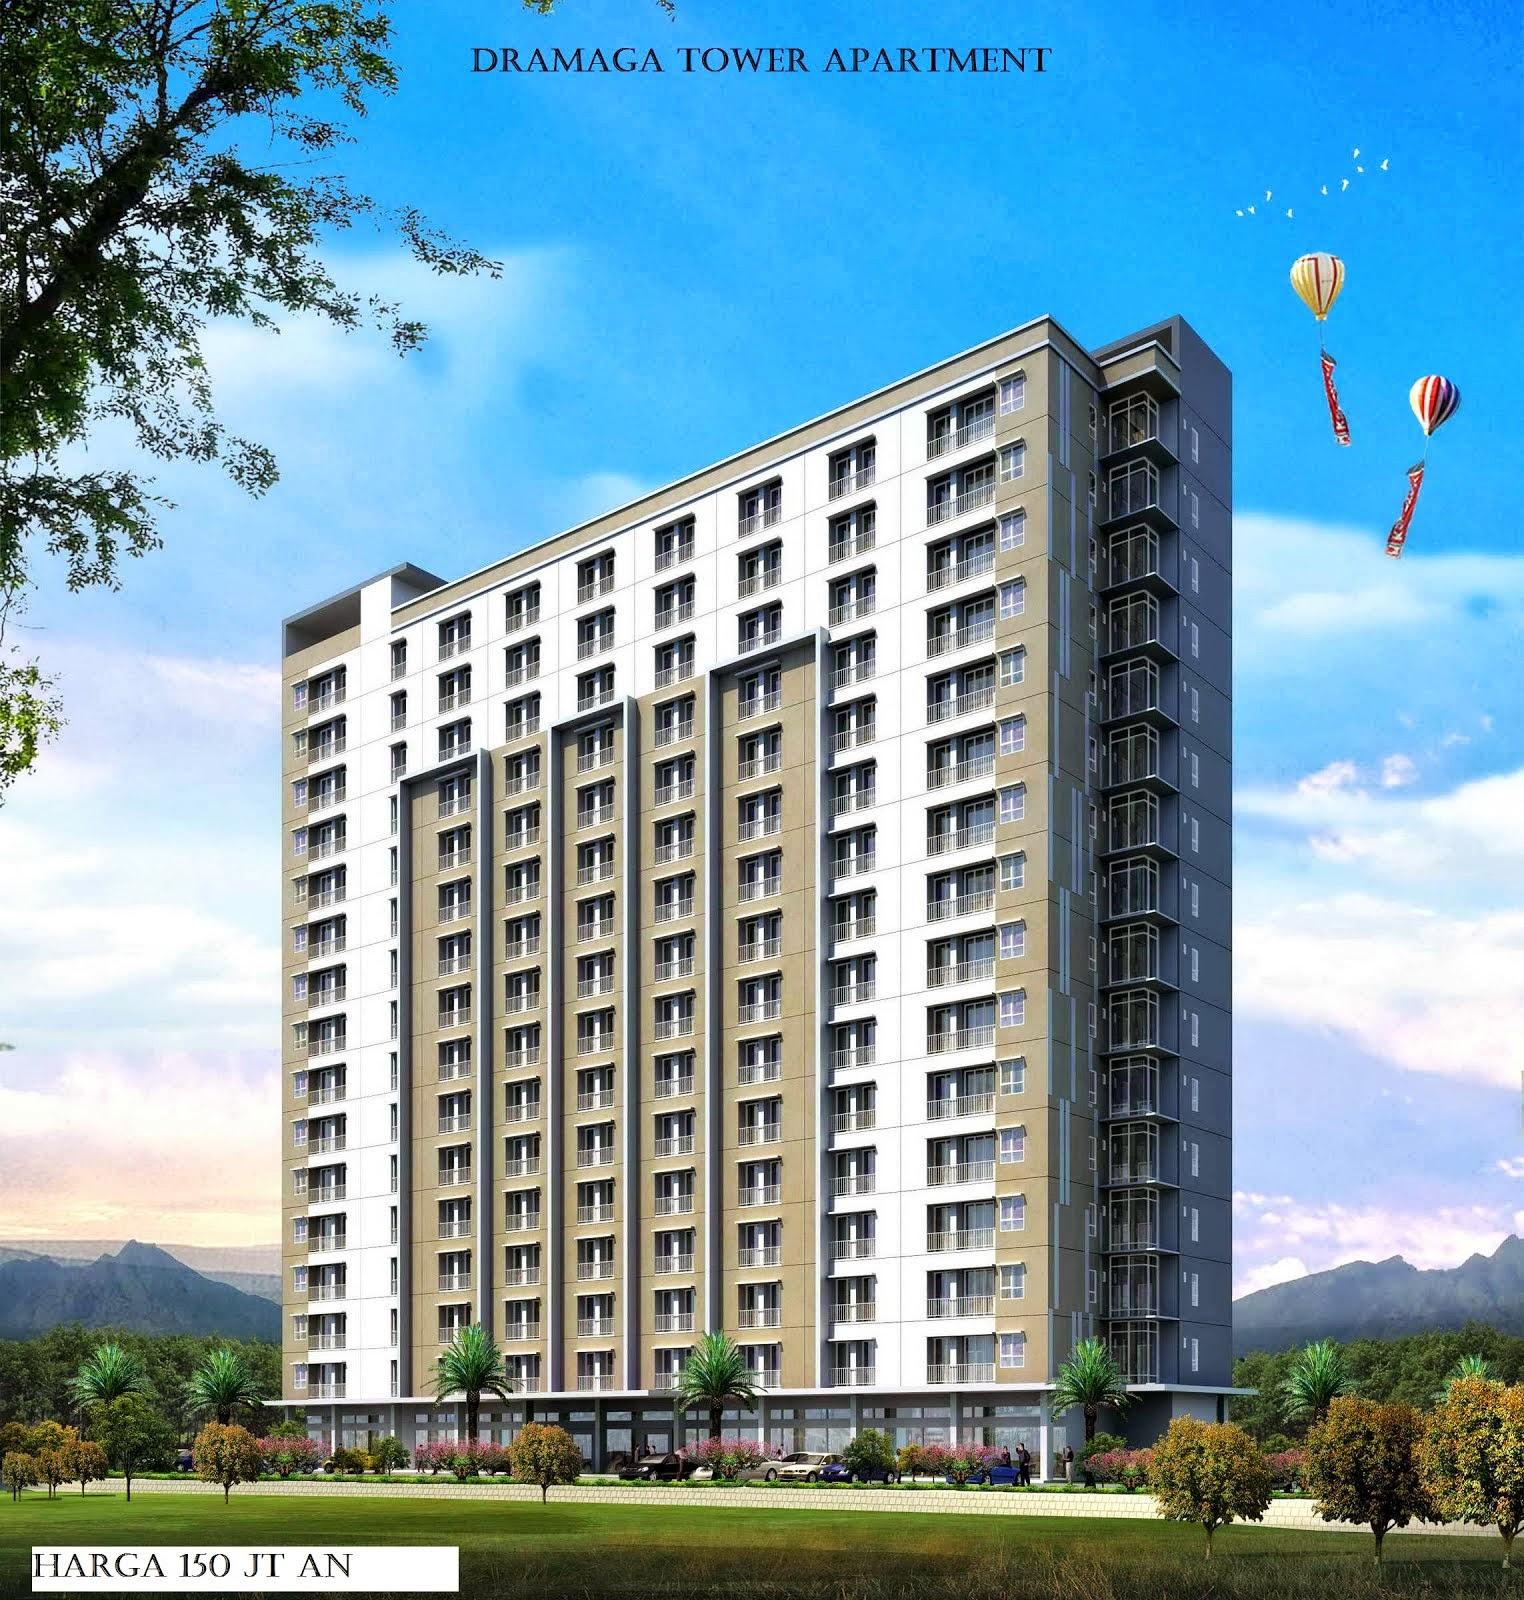 Dramaga Tower Apartment